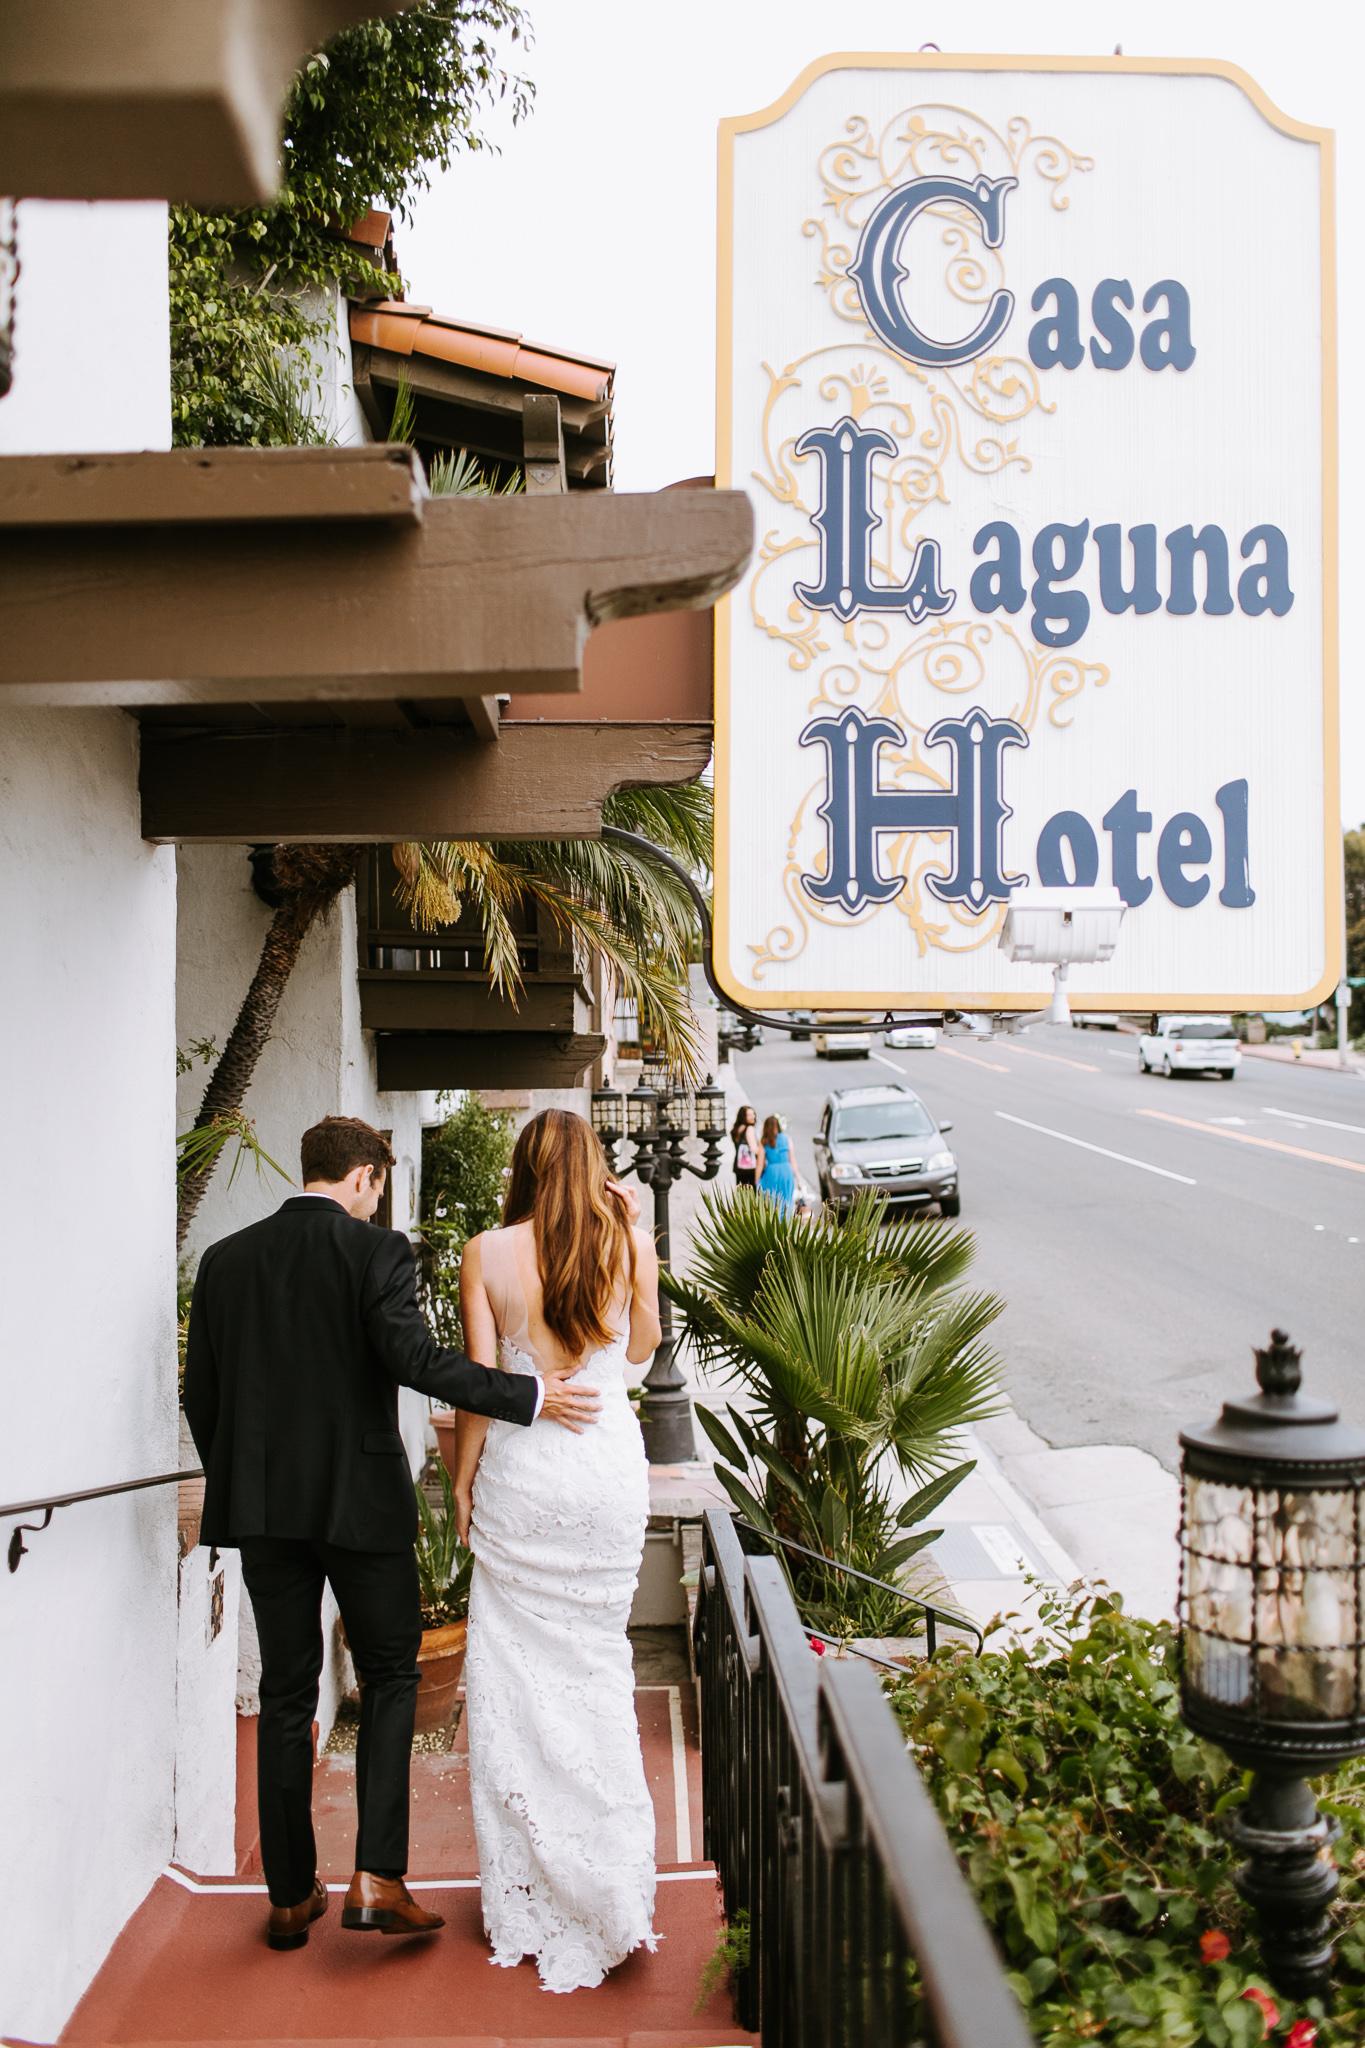 LagunaBeach-WeddingPhotographer-24.jpg